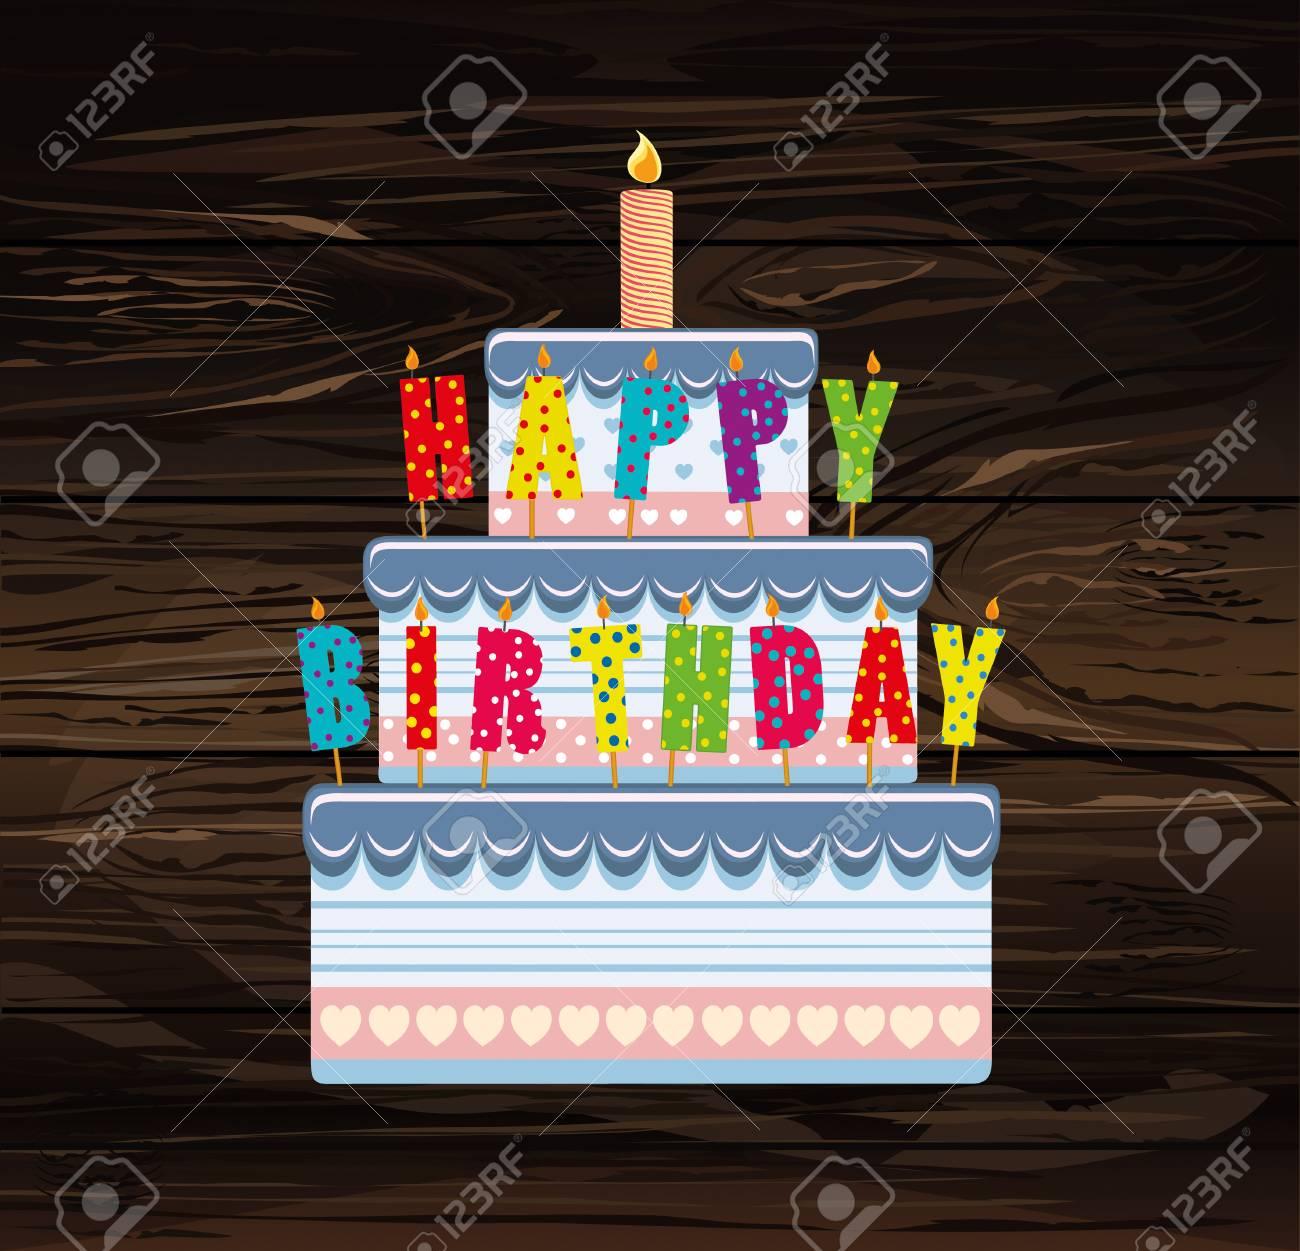 Festive Big Cake Letters Happy Birthday Greeting Card Or Invitation